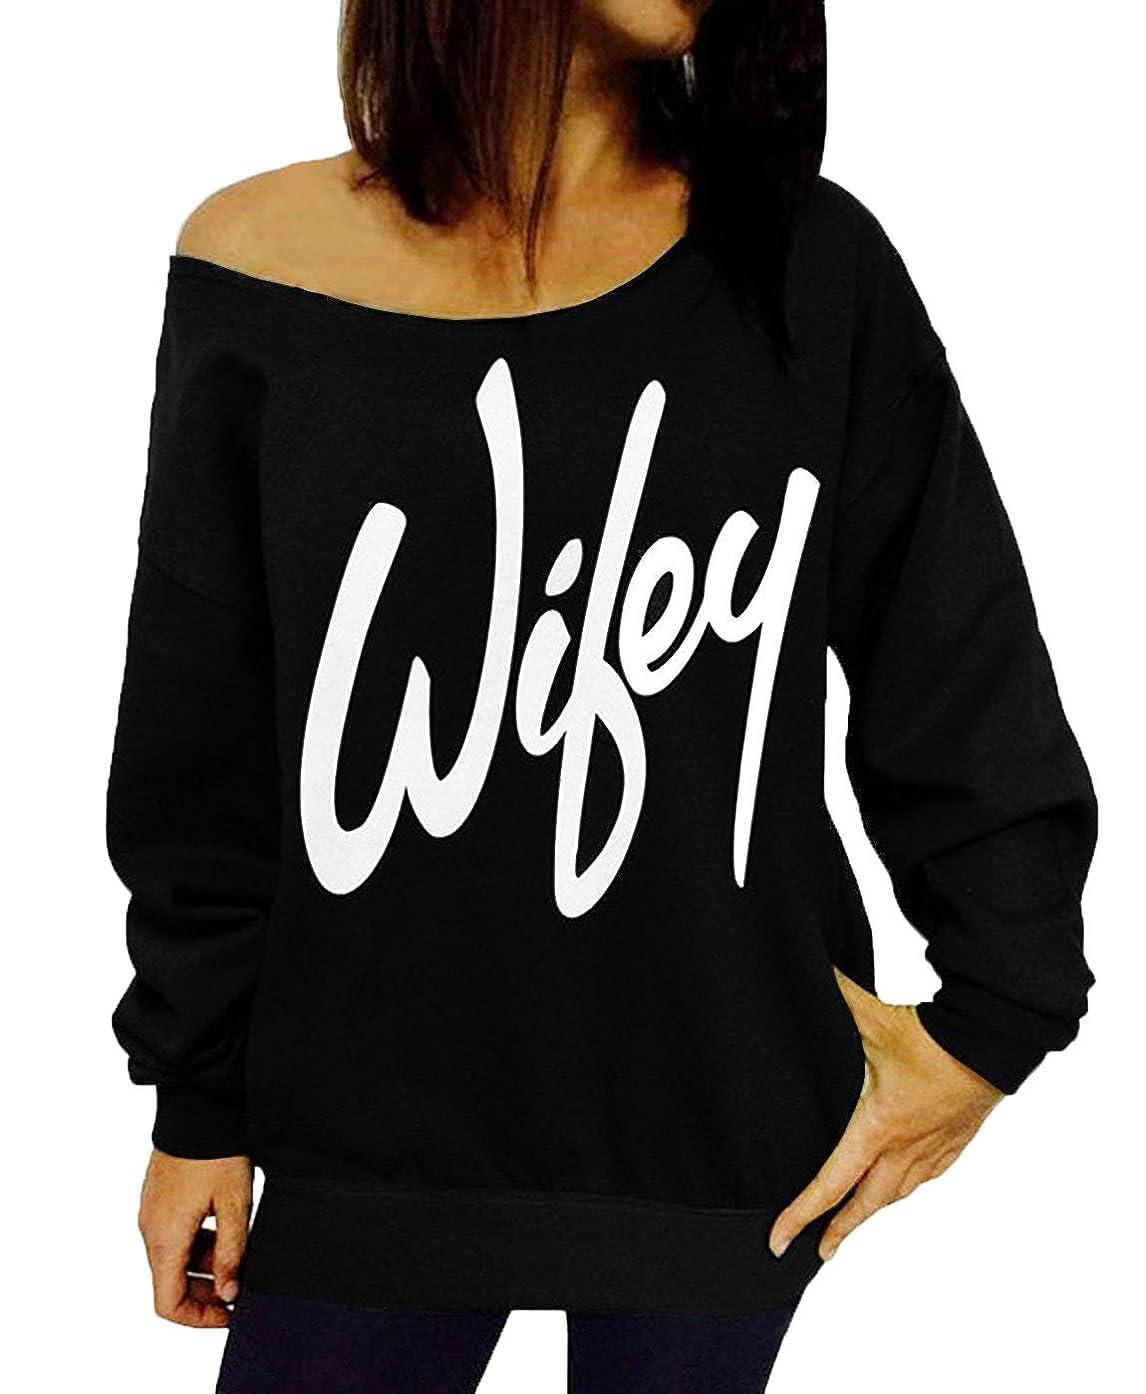 GSVIBK Womens Black Sweatshirts Long Sleeve Off Shoulder Sweatshirt Pullover Letter Printed Shirt Wifey Top